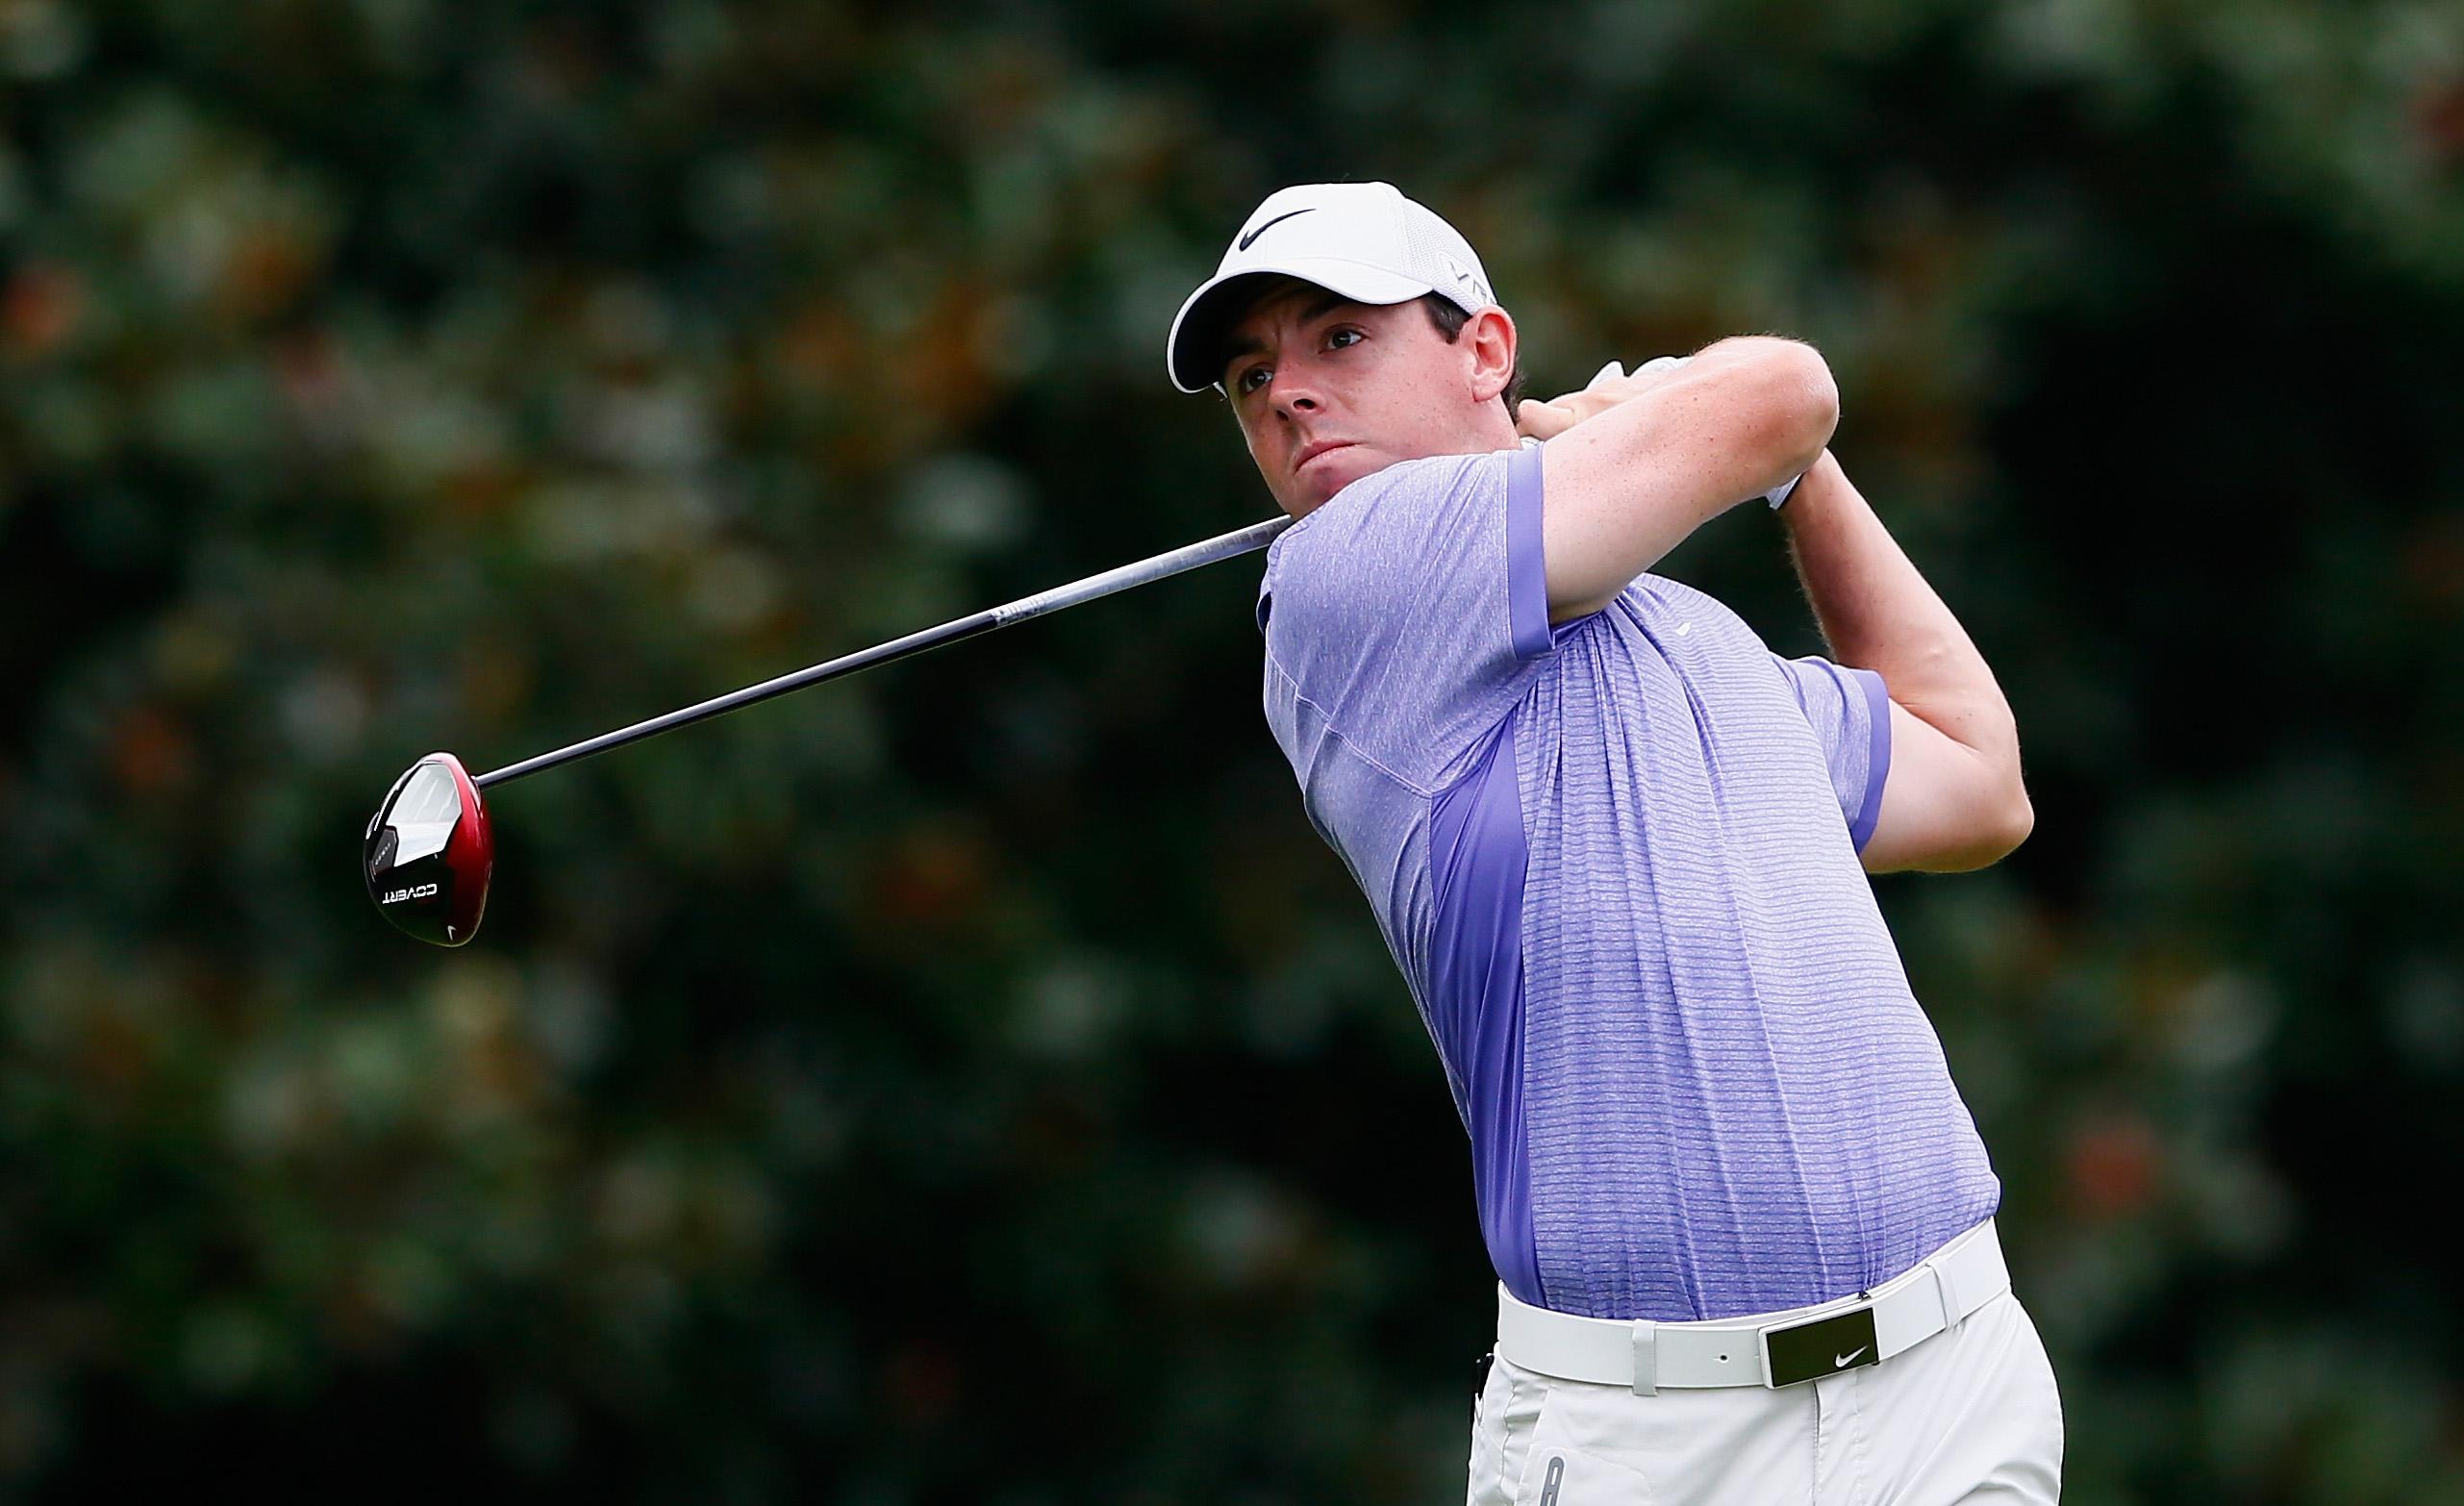 Rory Tour Championship Wednesday